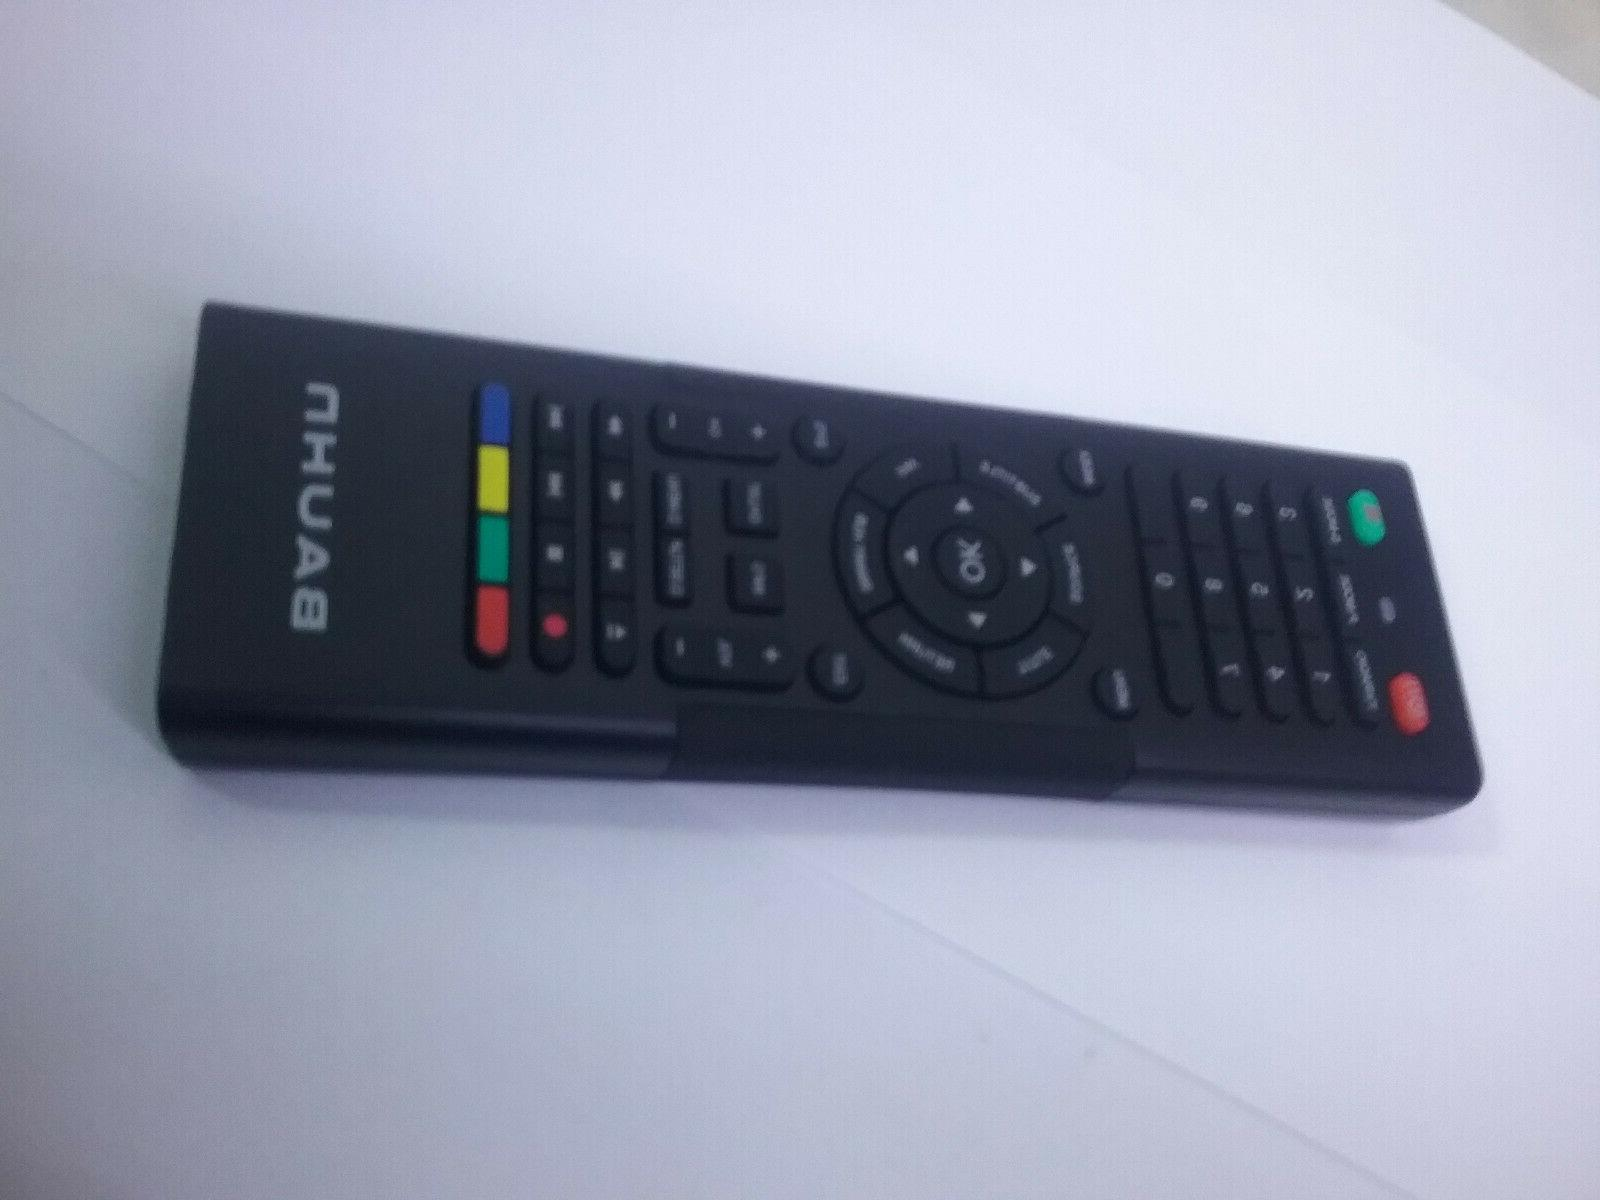 genuine lcd tv atvs65 0716 remote control